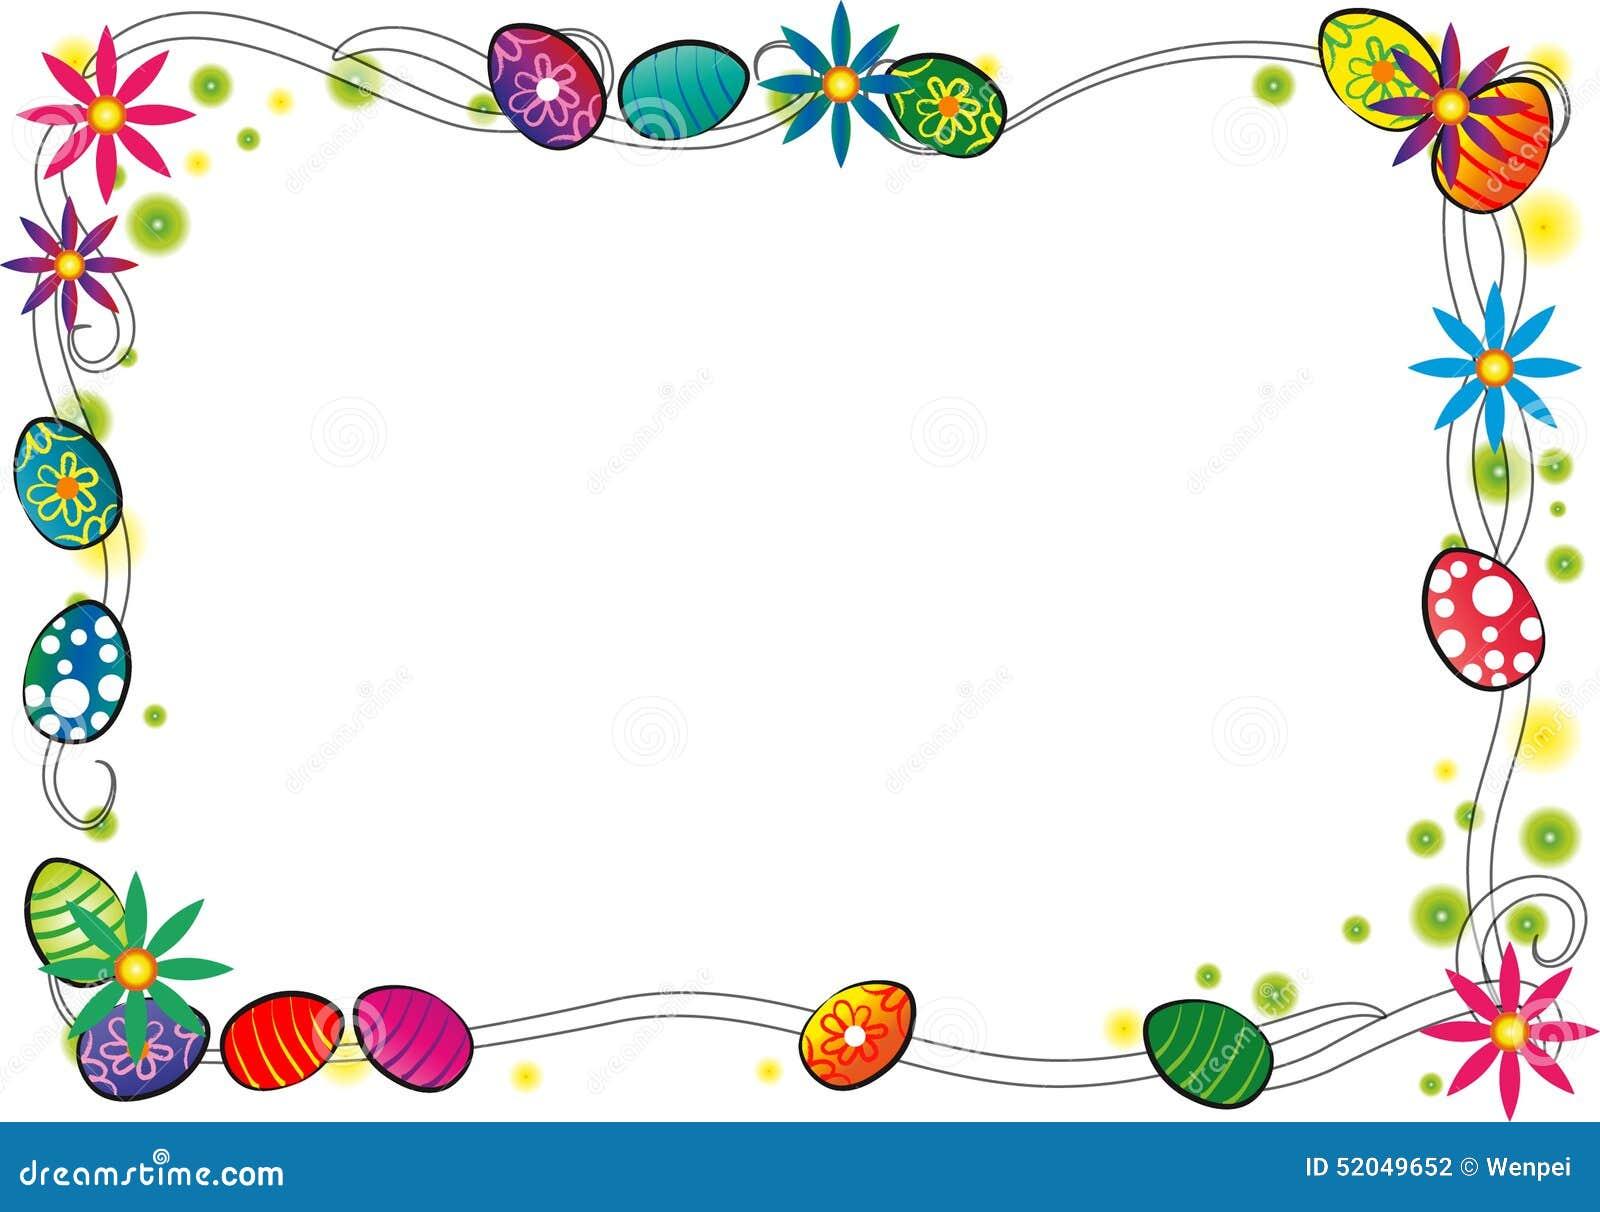 happy easter border stock illustration image 52049652